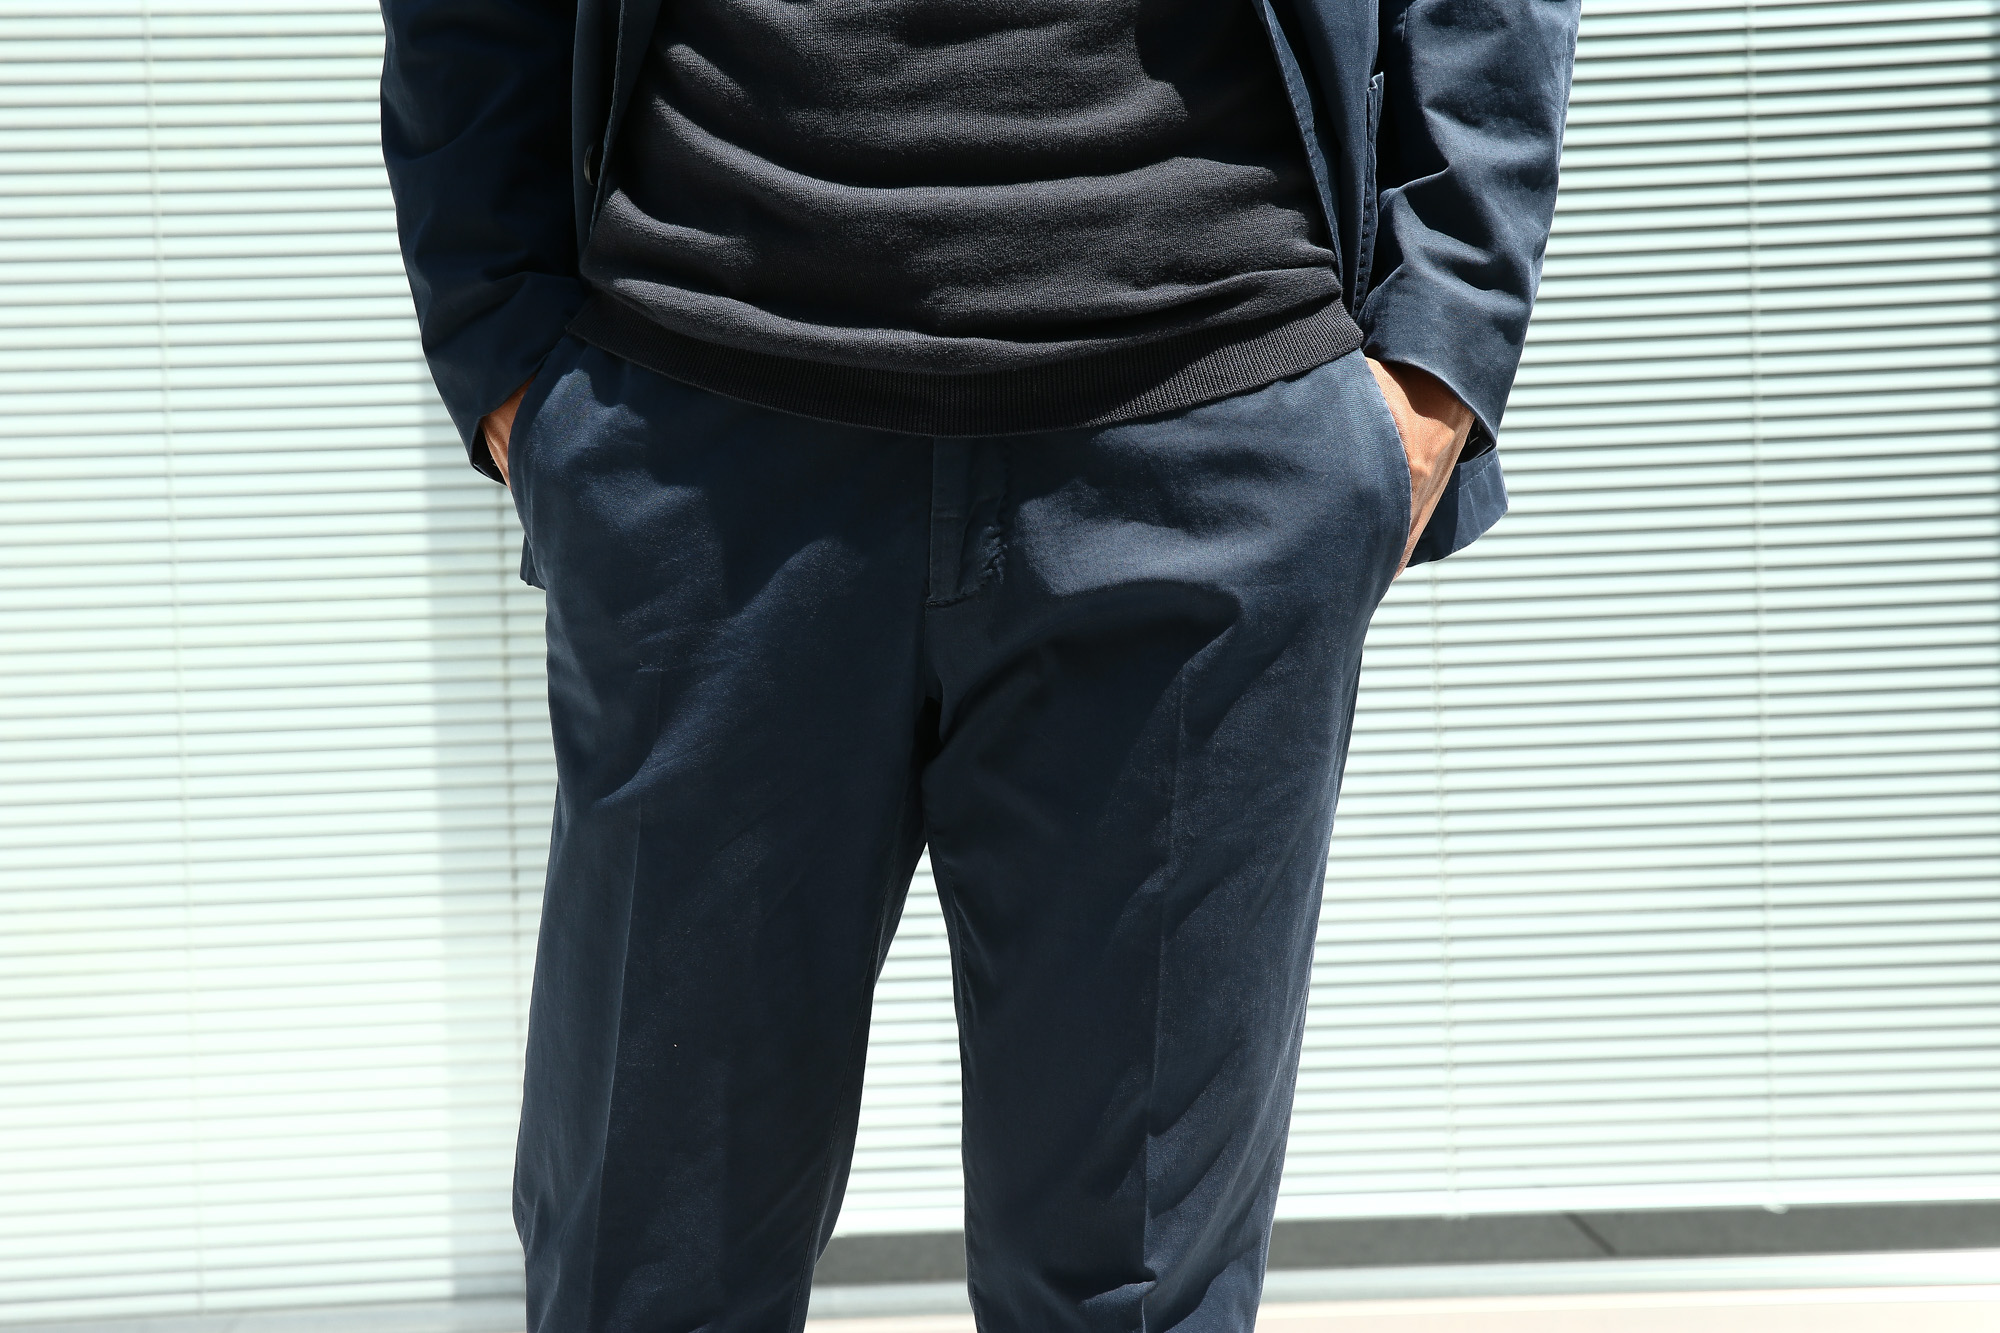 BOGLIOLI MILANO (ボリオリ ミラノ) K.JACKET (Kジャケット) ストレッチ コットン ツイル 3B スーツ NAVY (ネイビー・73) Made in italy (イタリア製) 2018 春夏新作 boglioli ボリオリ 愛知 名古屋 Alto e Diritto アルト エ デリット alto e diritto アルトエデリット